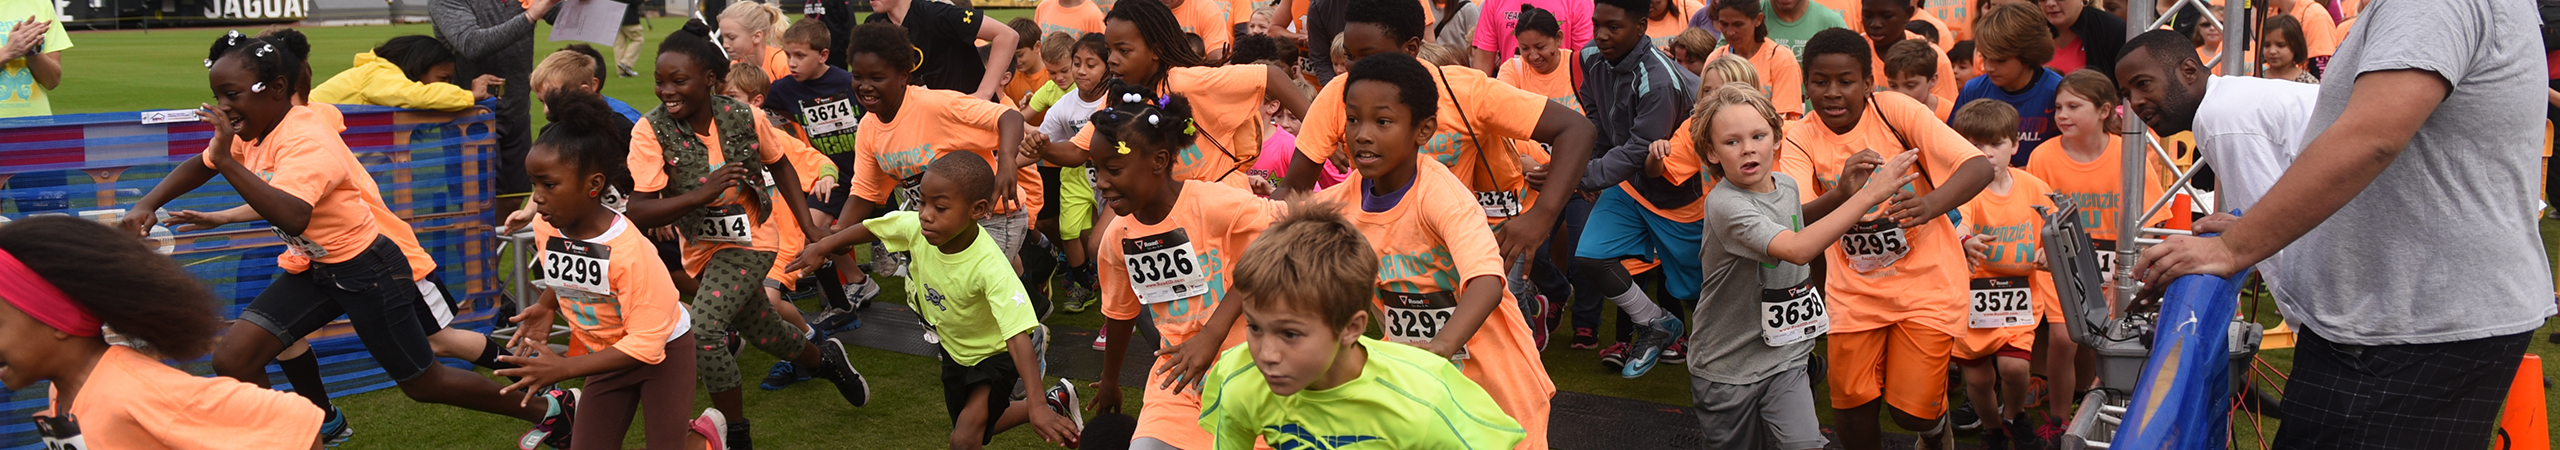 5th Annual McKenzie's Run